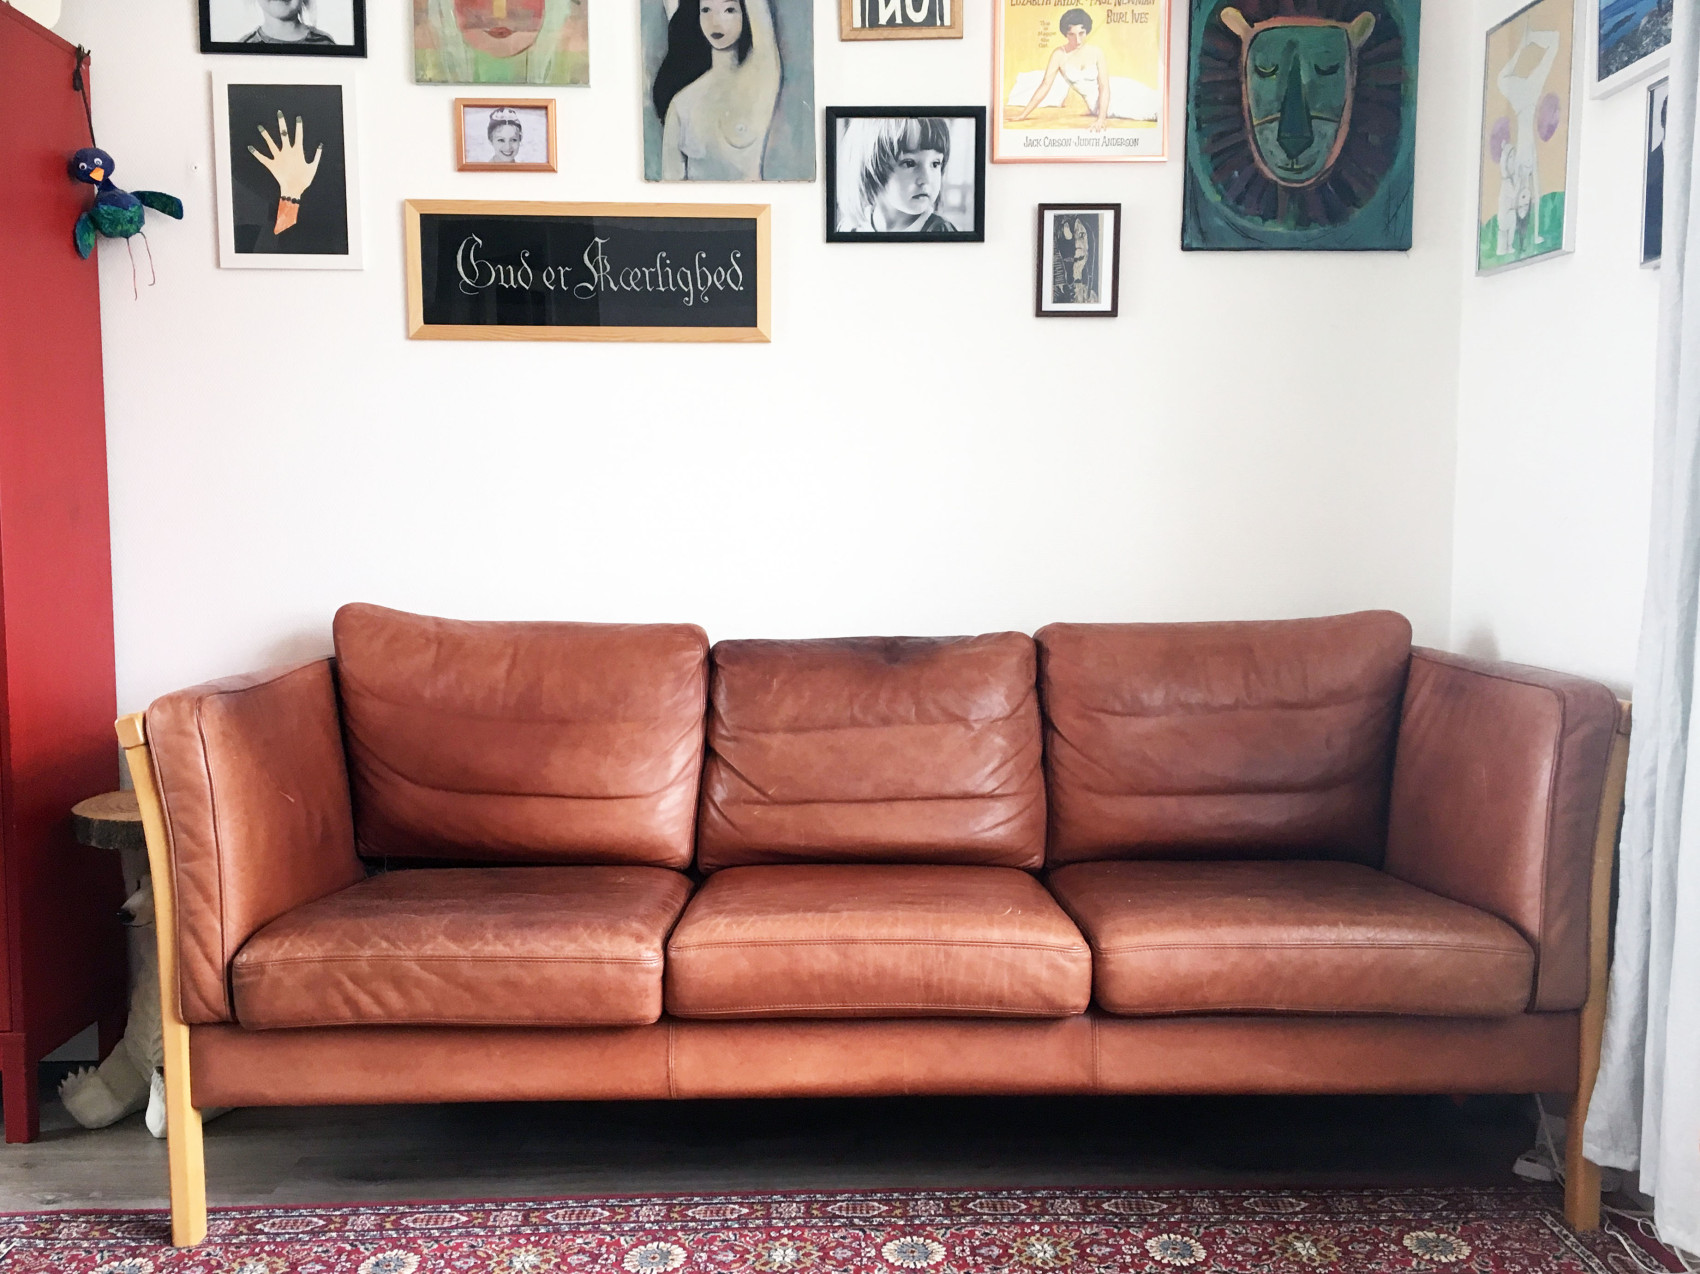 De smukkeste velour sofaer 2